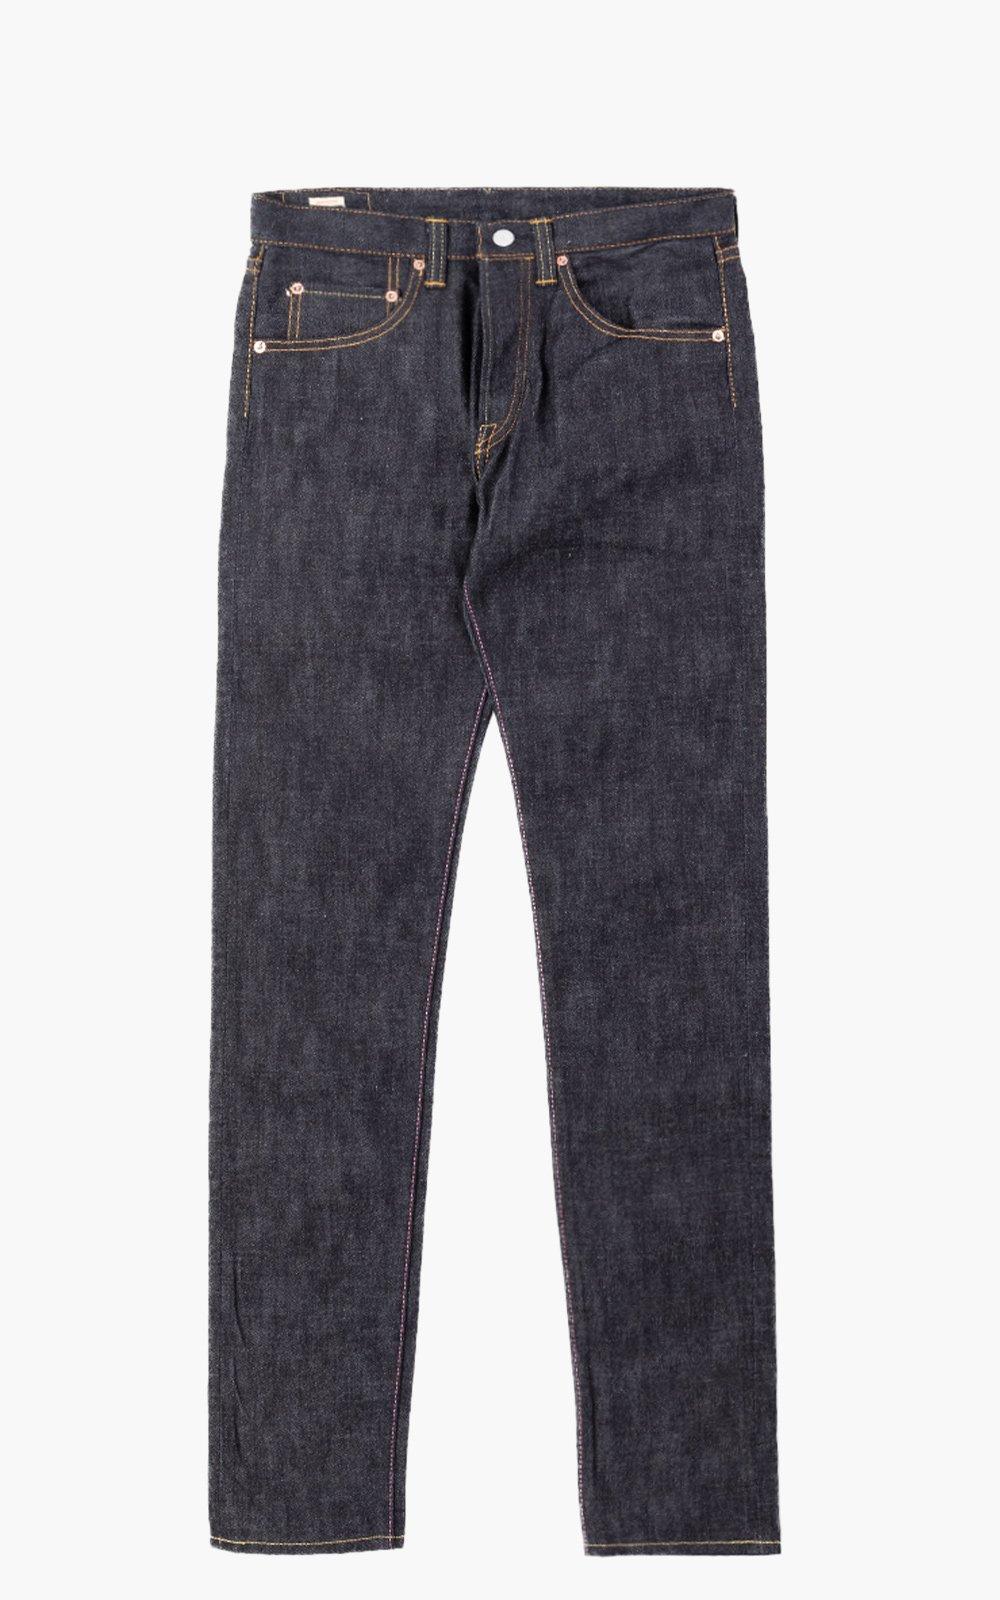 Momotaro jeans 20 Oz Zimbabwe cotton 0601